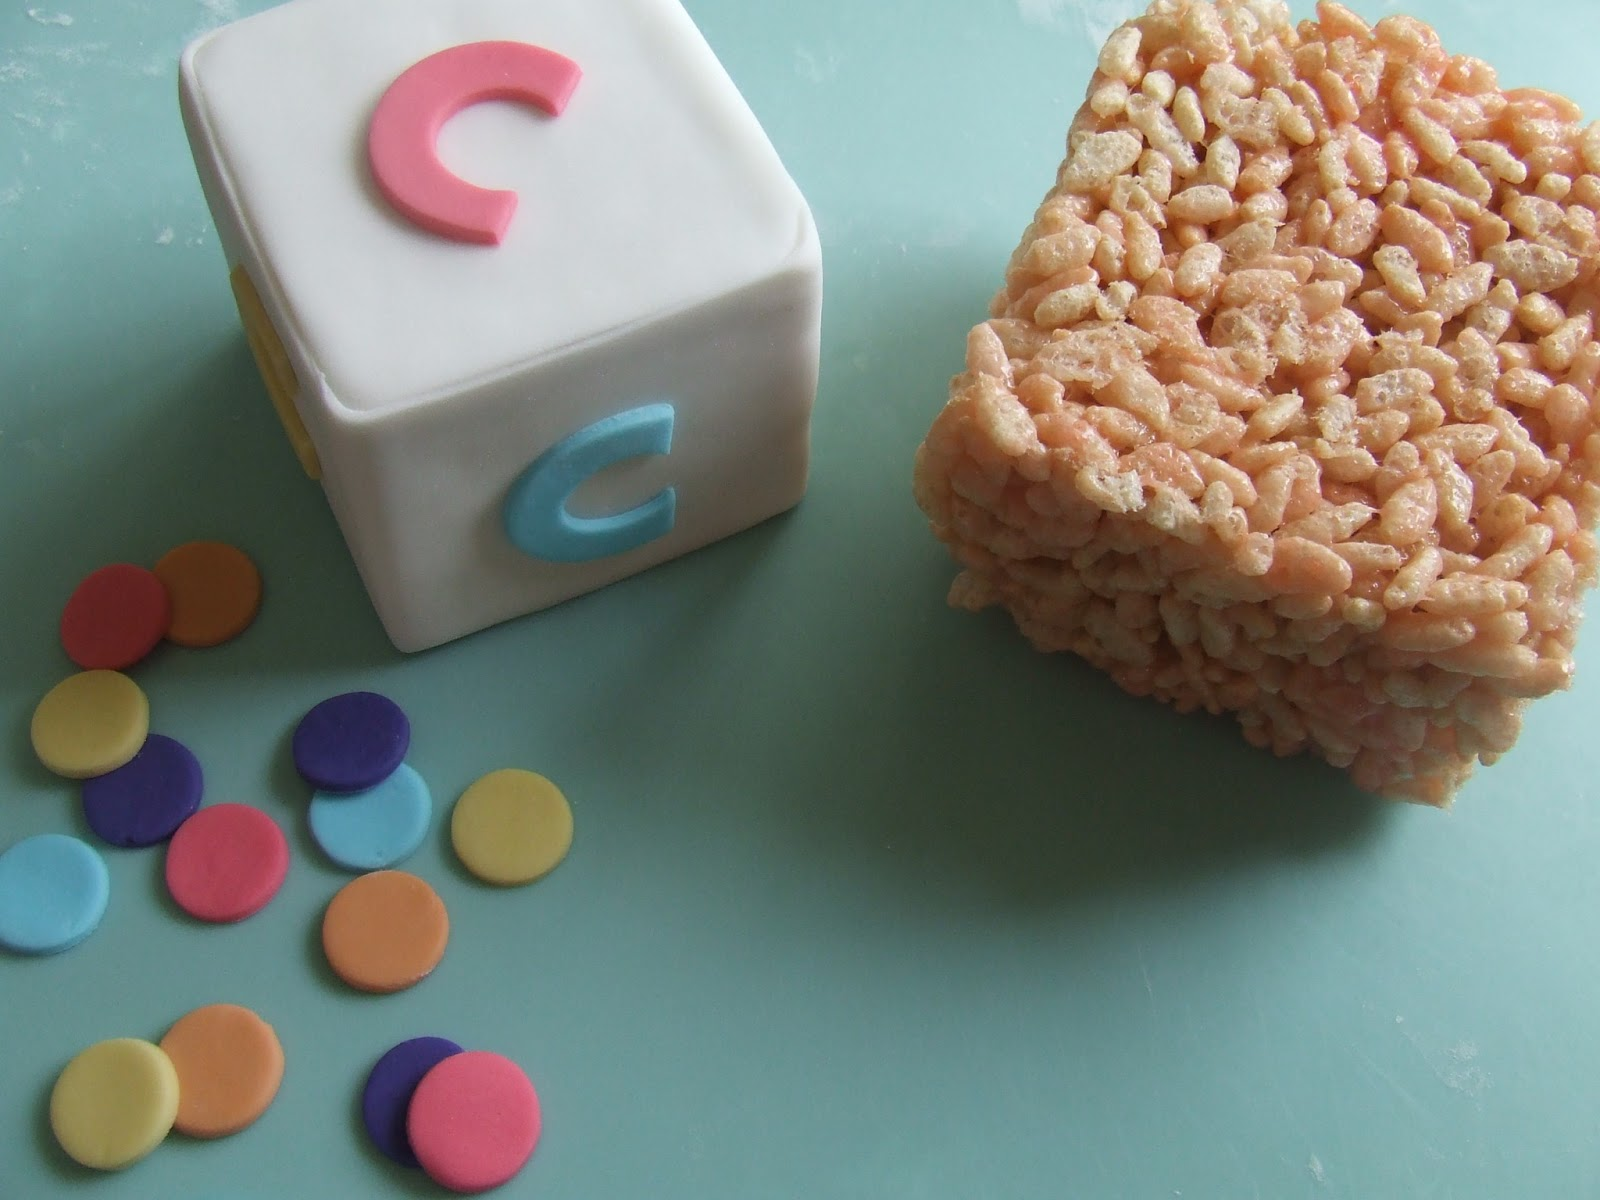 Kiwi cakes alphabet block cake topper from kiwicakes for Alphabet blocks cake decoration